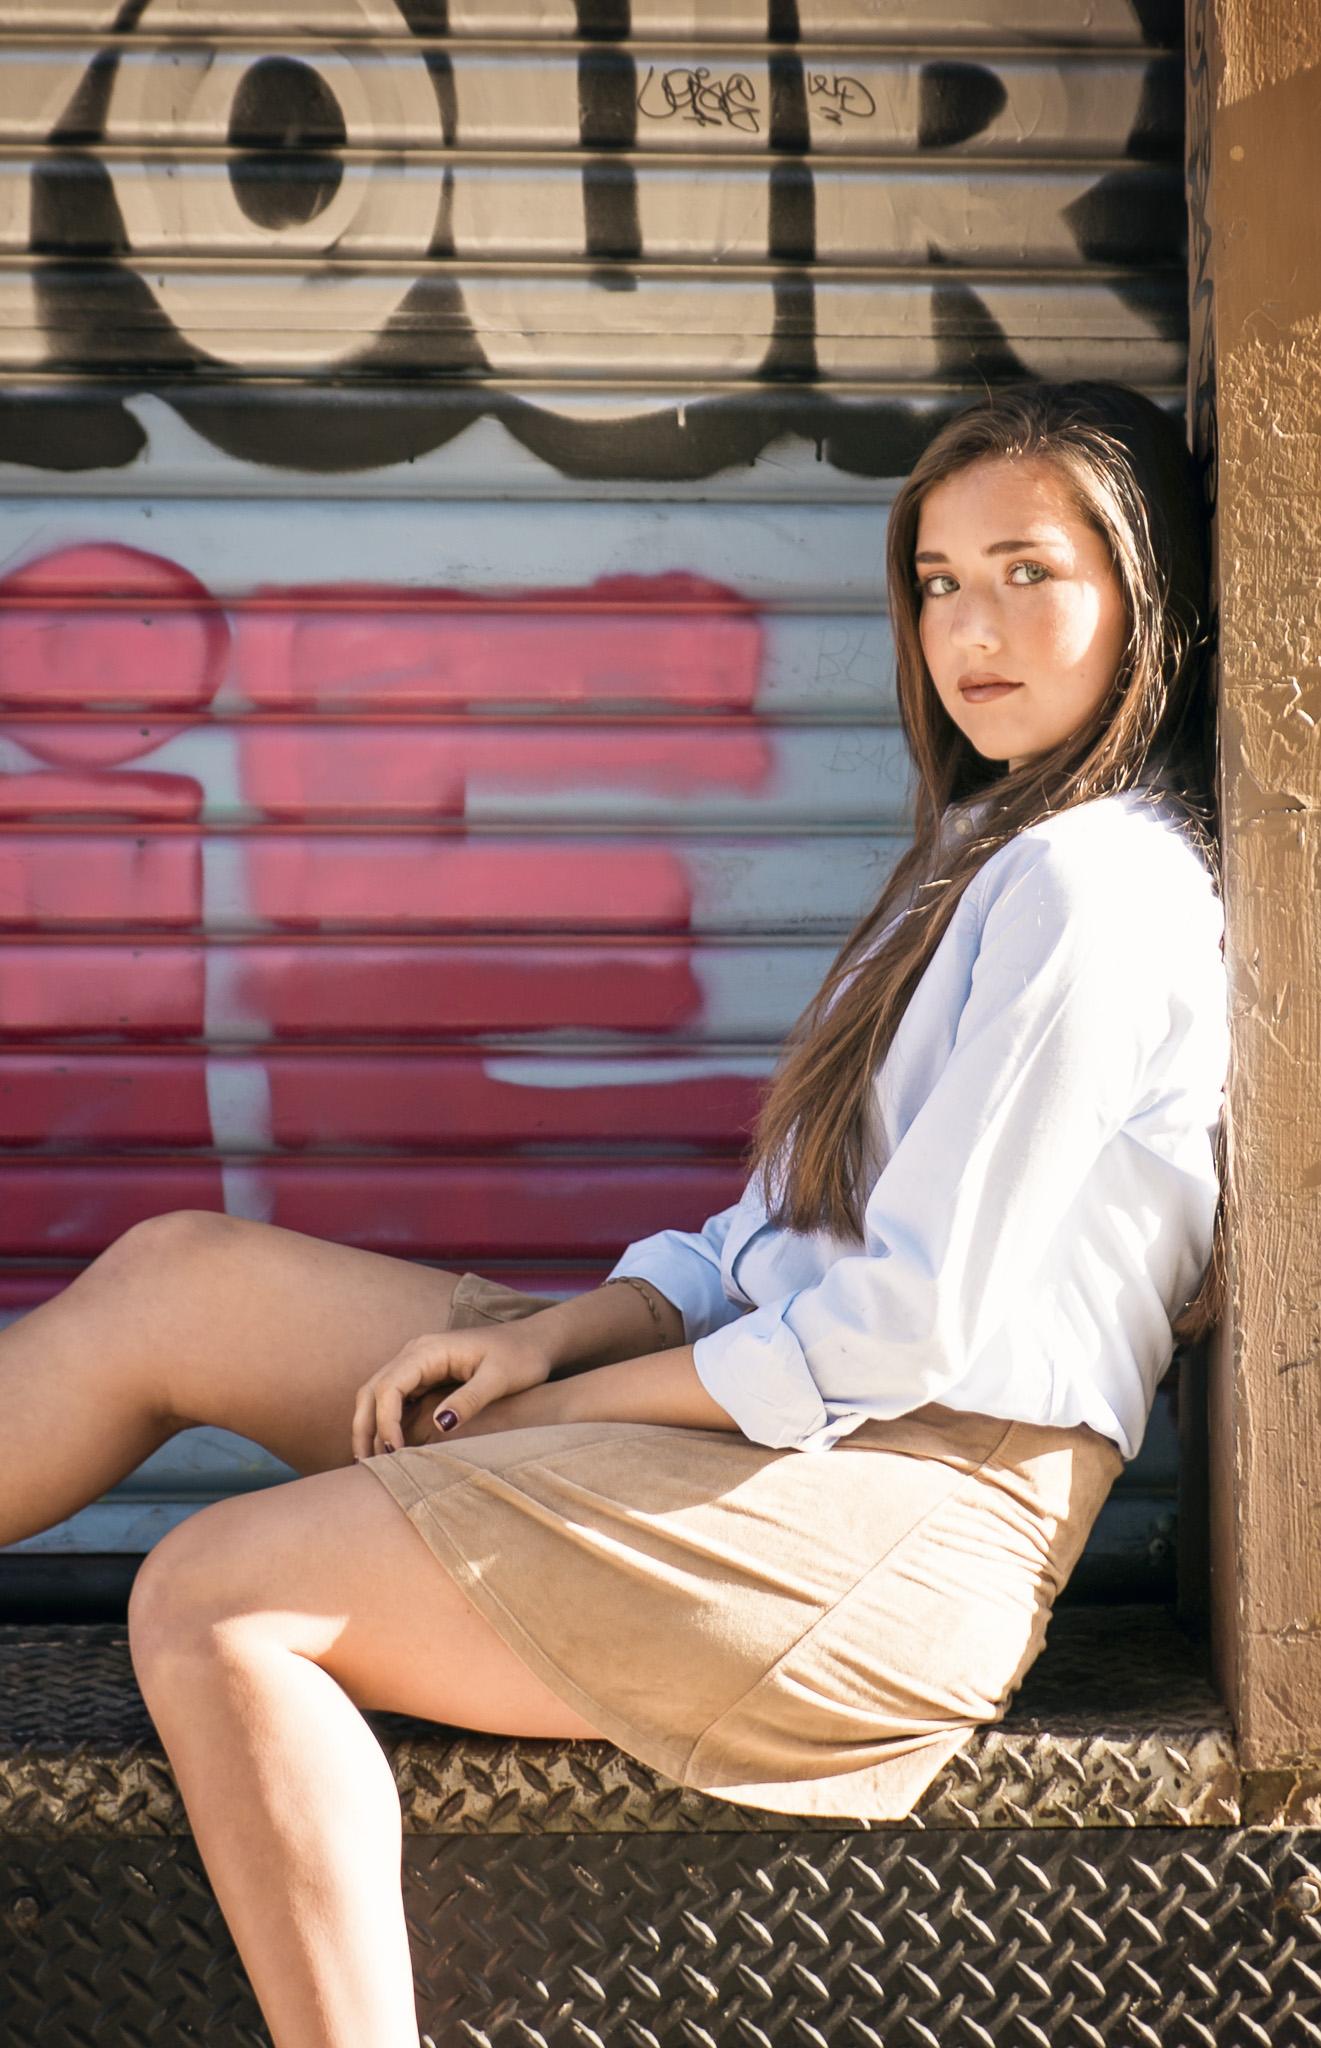 shawna-parks-photo-Alexis-Snodgrass-teen-portraits-san-diego010.jpg